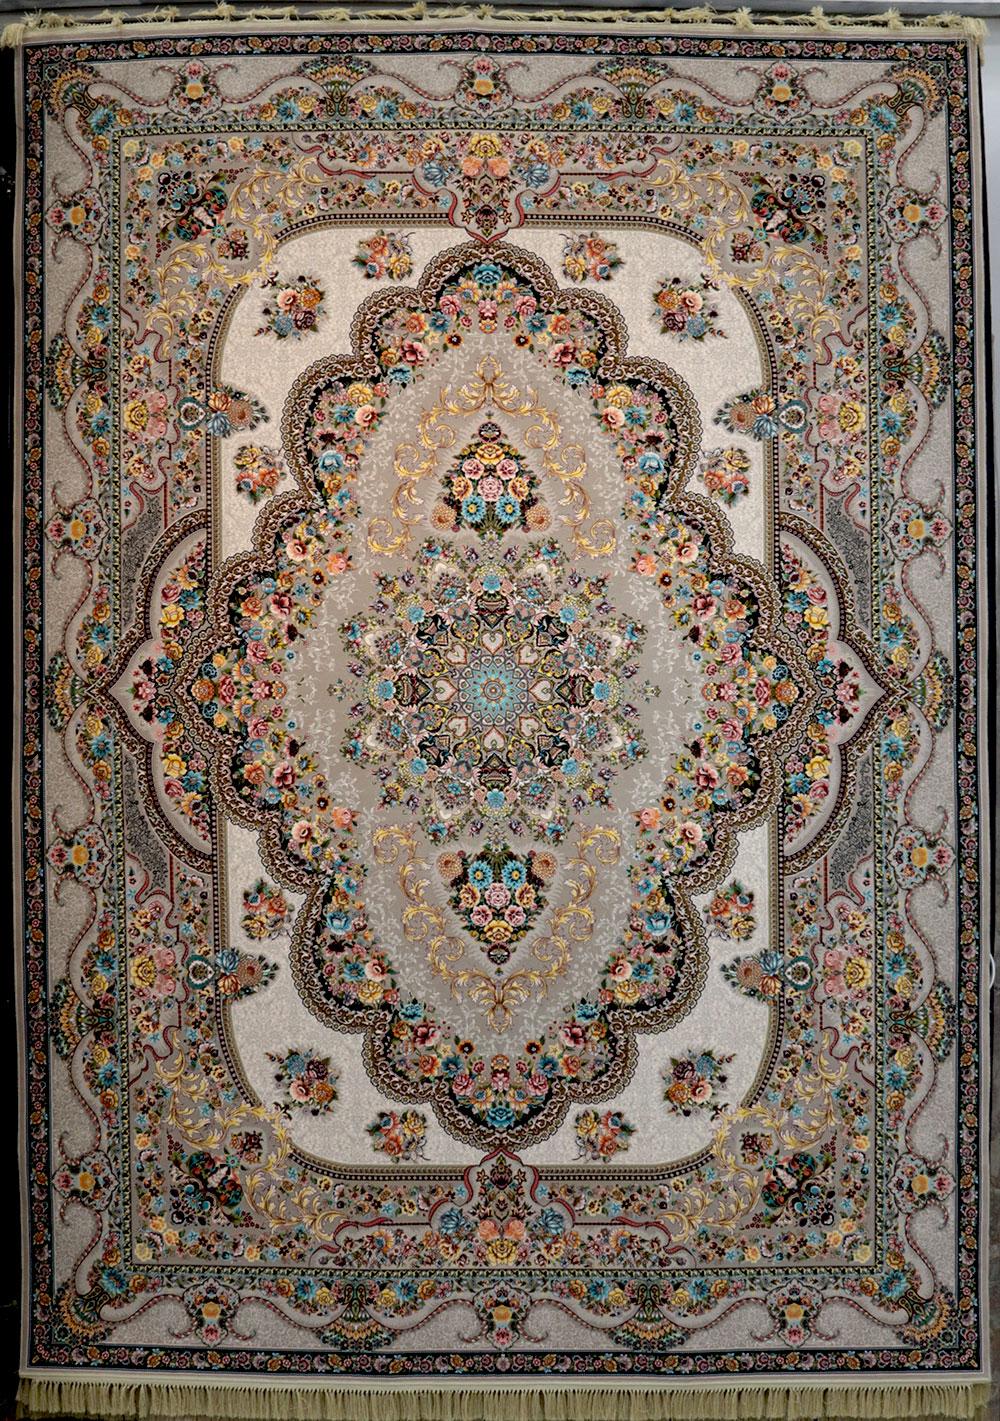 فرش کاشان- نقشه بهشت ترمه ای 1200 شانه